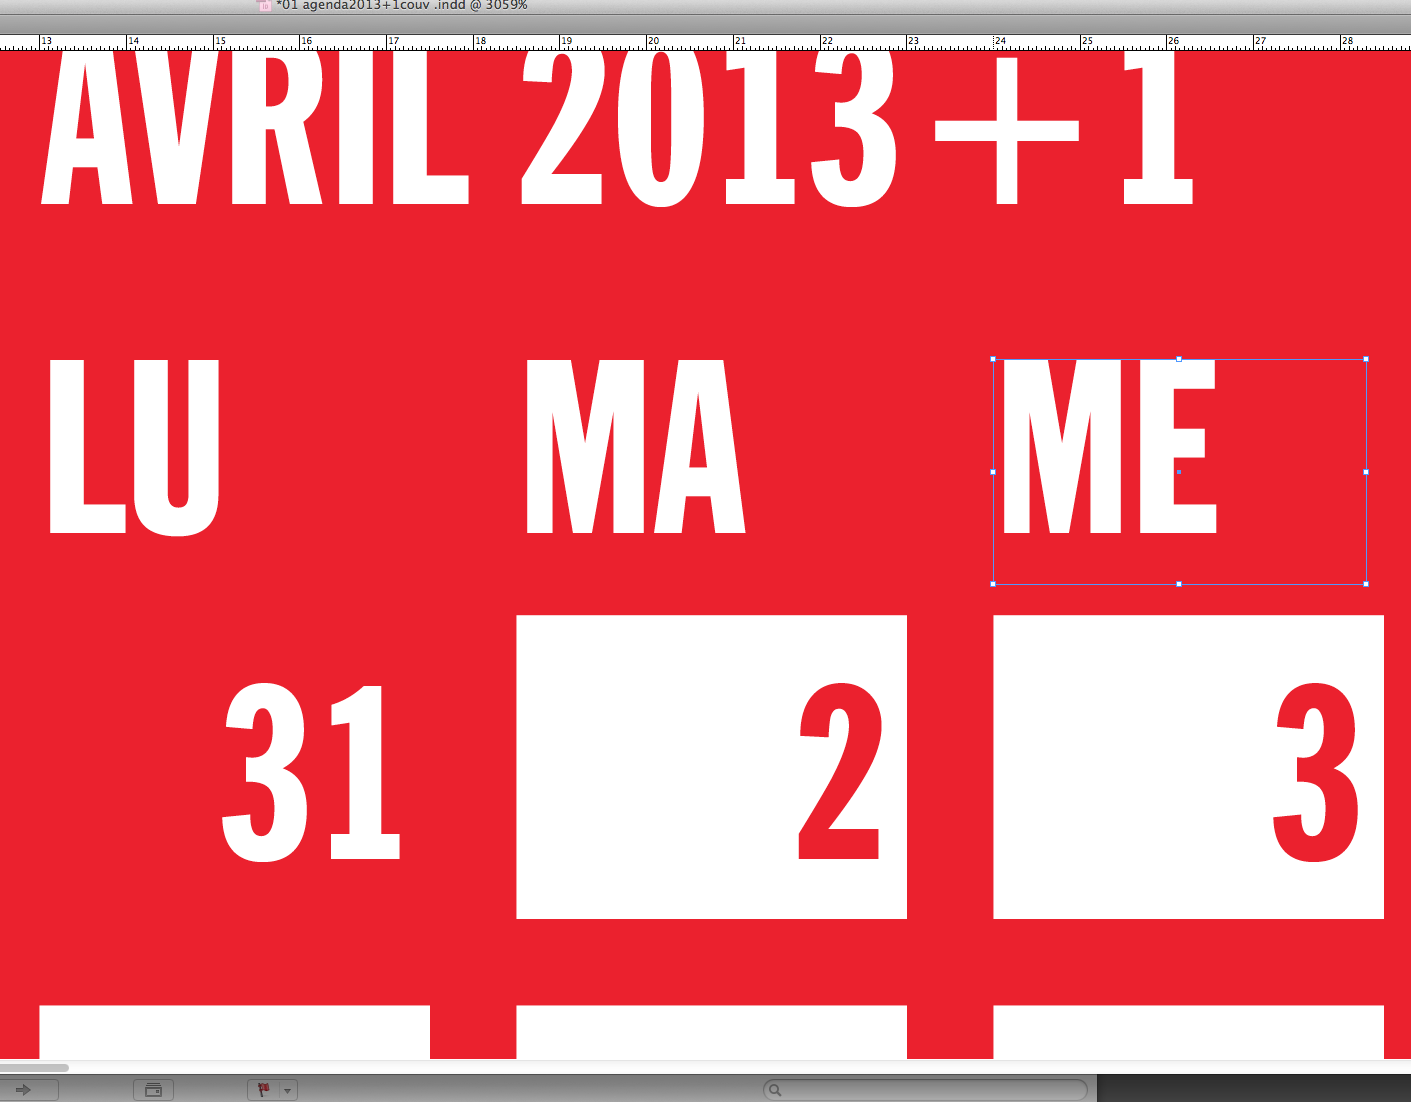 shannon : houbard : boileau : violy : agenda design dept. irregulomadaire 2013+1 b